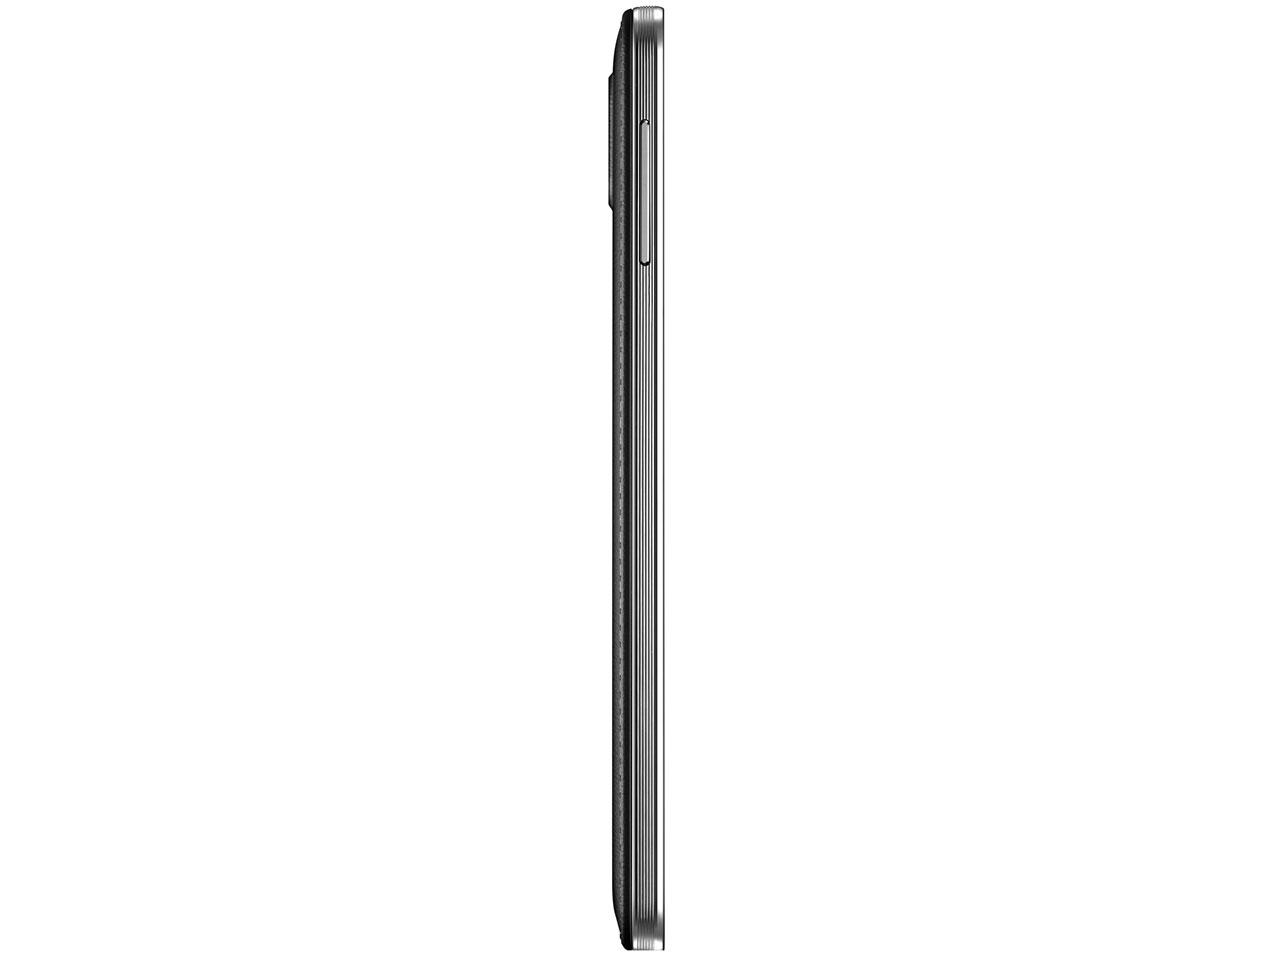 『本体 左側面』 GALAXY Note 3 SC-01F docomo [Jet Black] の製品画像